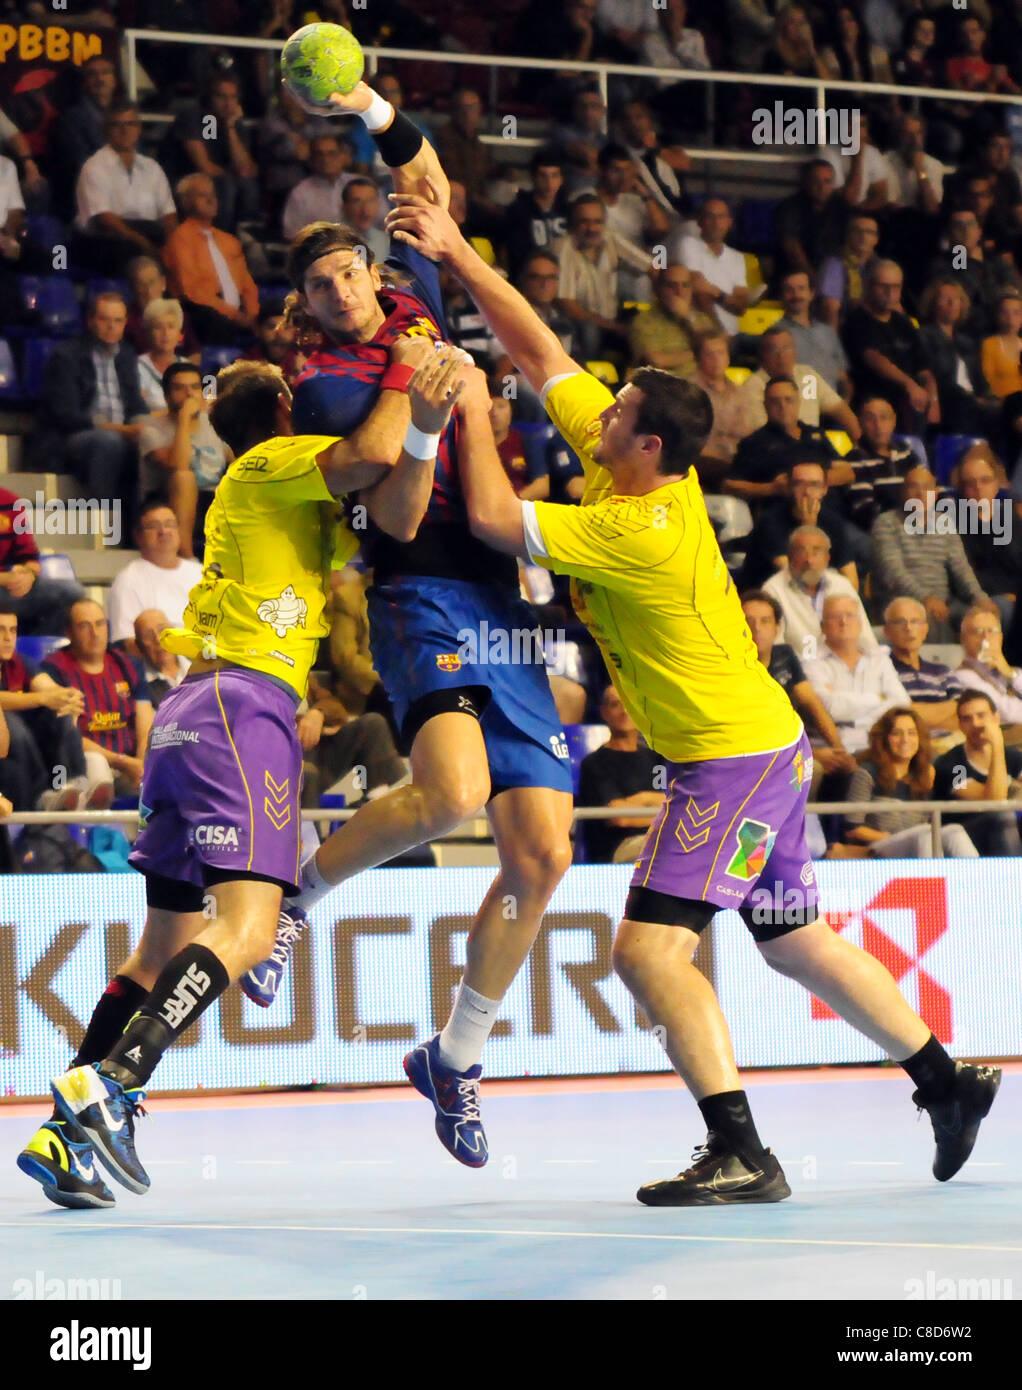 Lazlo Nagy (FC Barcelona Intersport) stoped by Cuatro Rayas Valladolid's defense - Stock Image